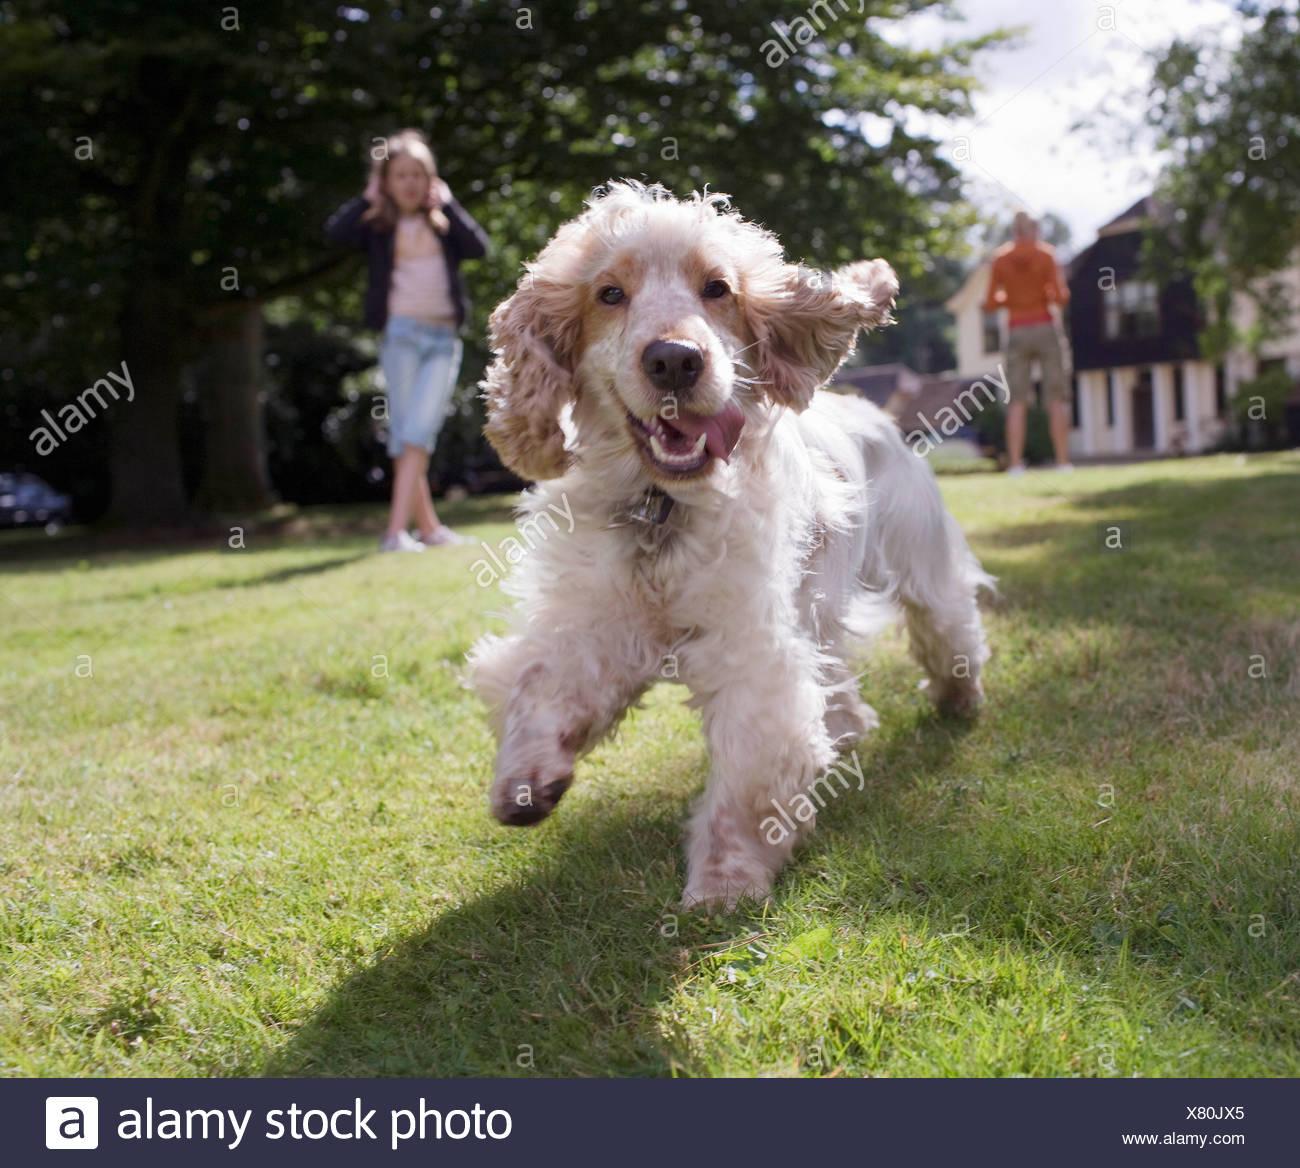 Hund läuft auf Kamera Stockbild